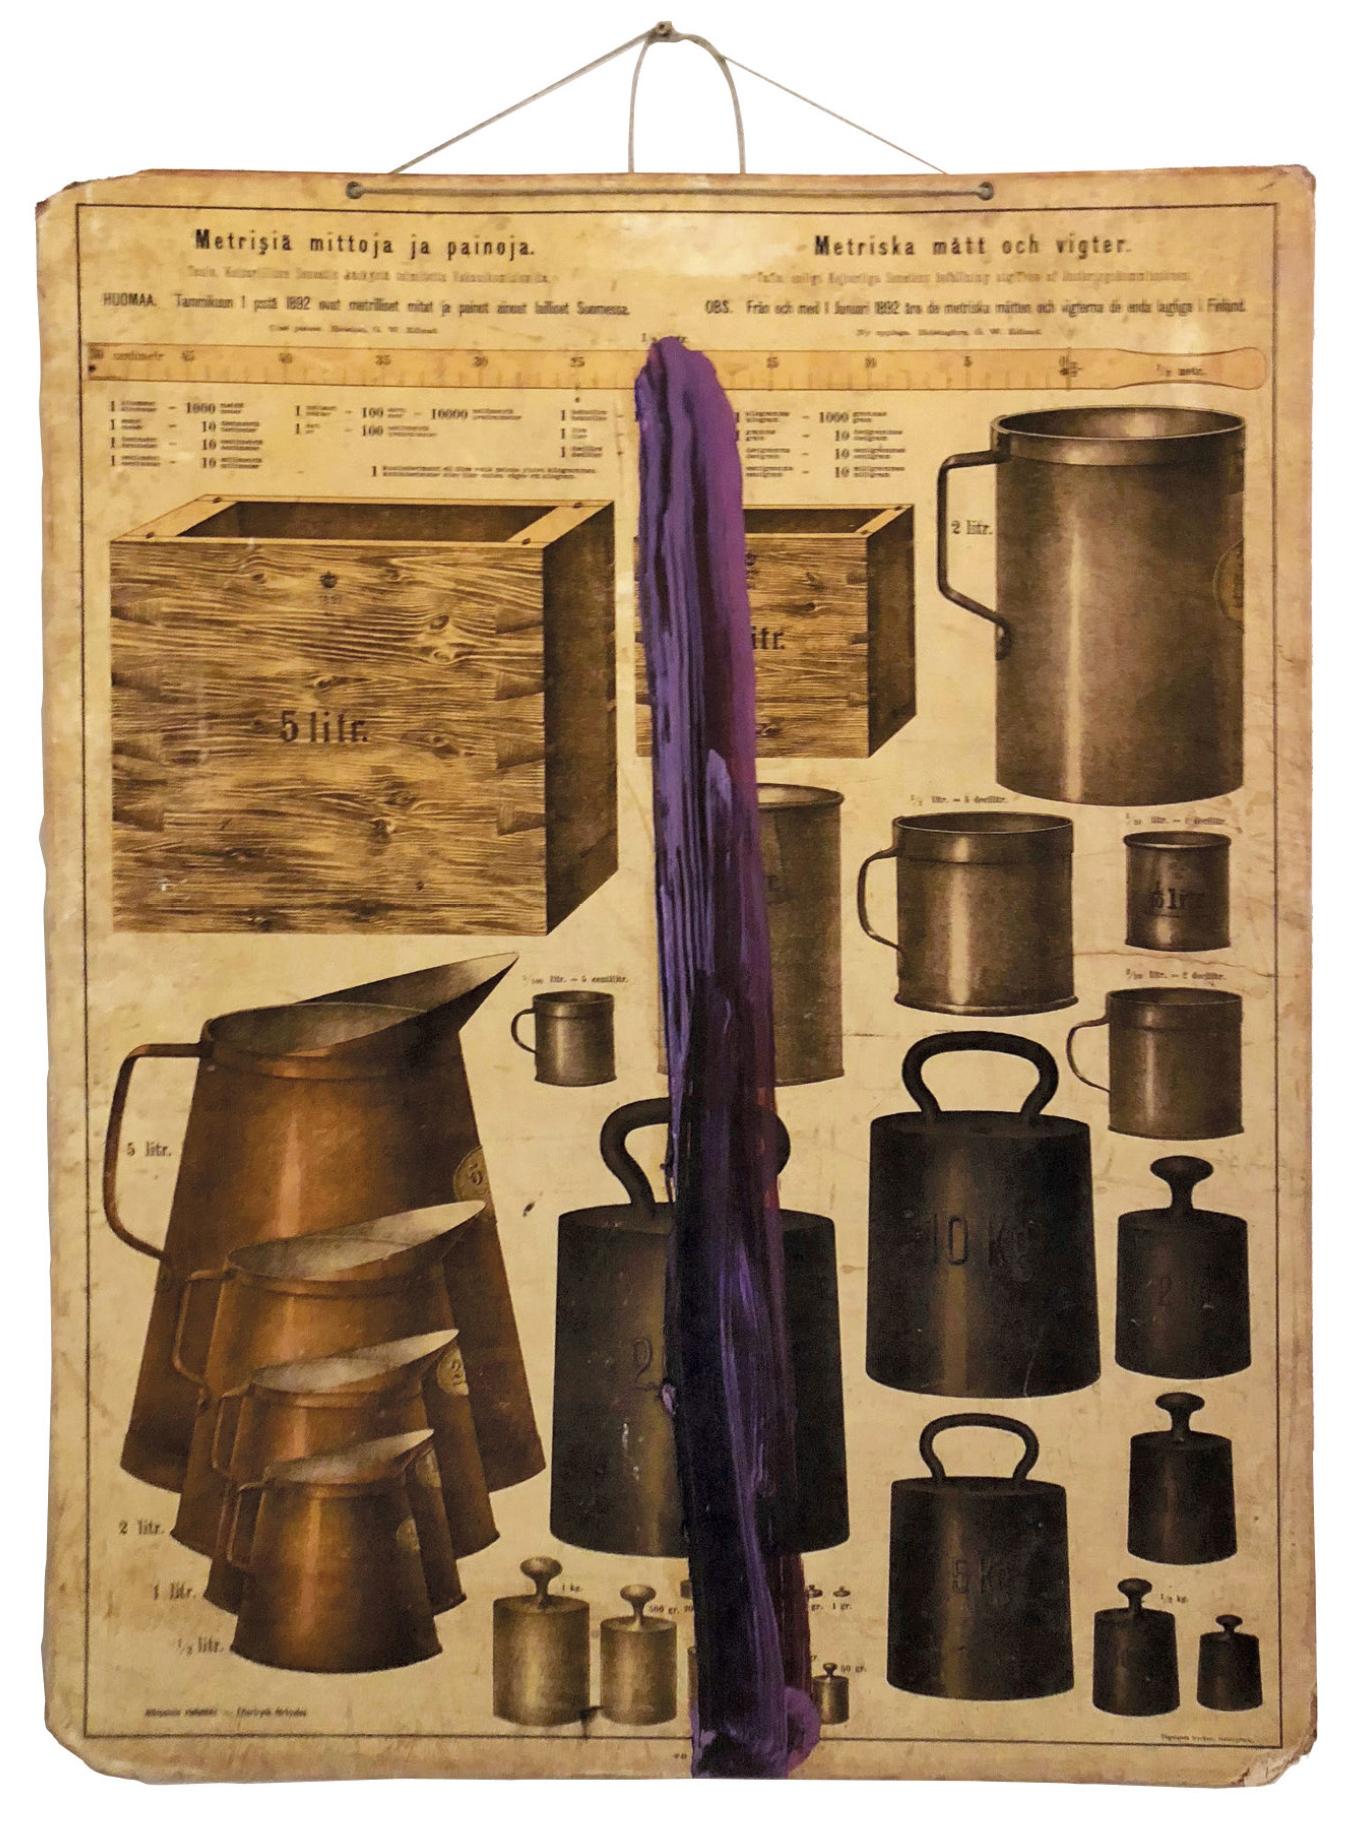 Lot 56 - Schnabel Julian (1952) Untitled, 2016 - Carbon print on fiber paper, mounted on board [...]